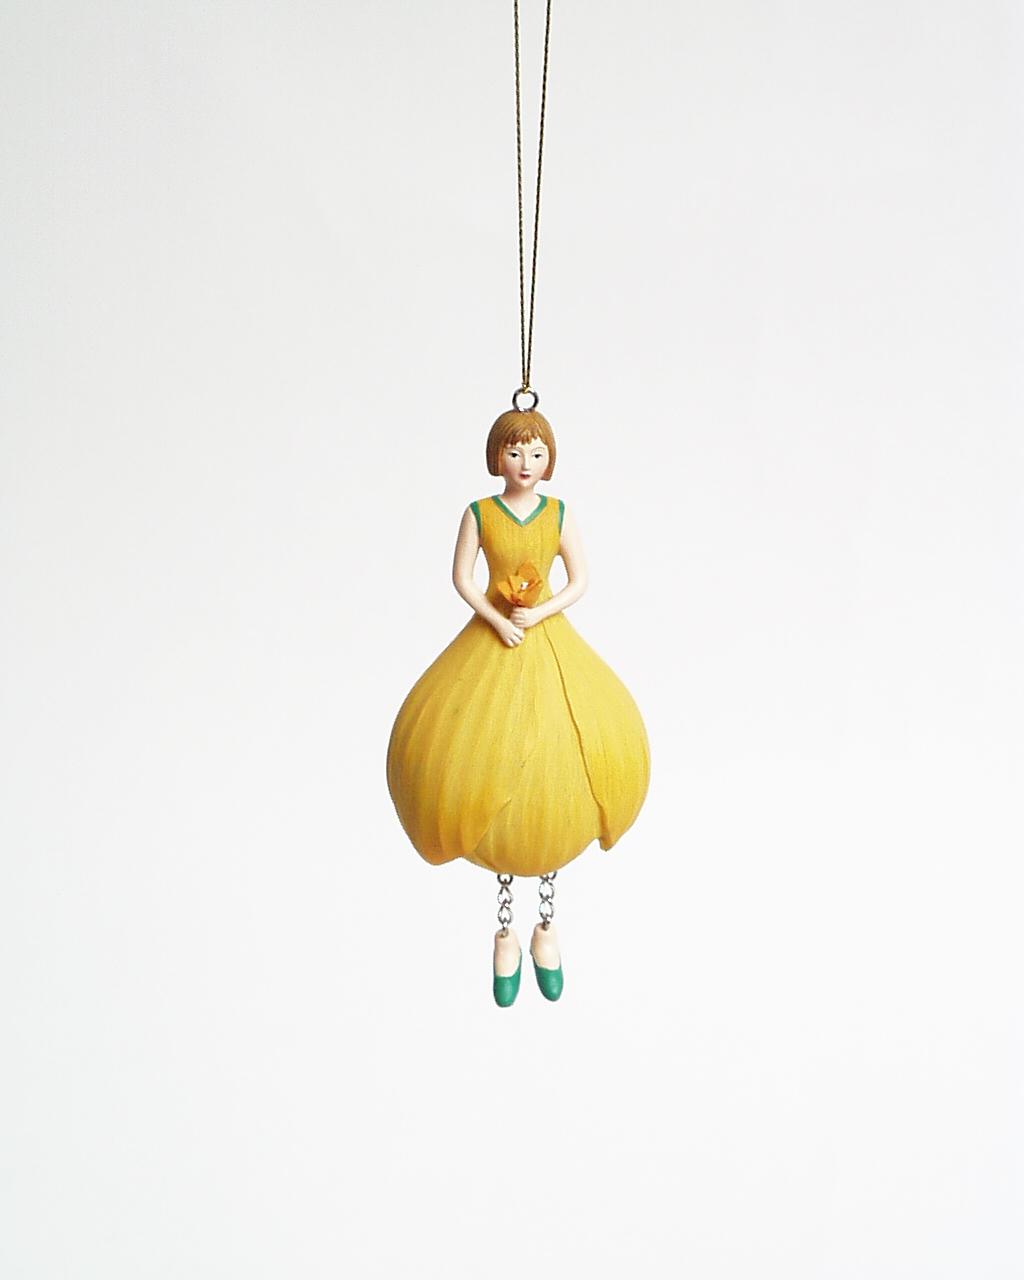 Krokus meisje hangend 12cm geel